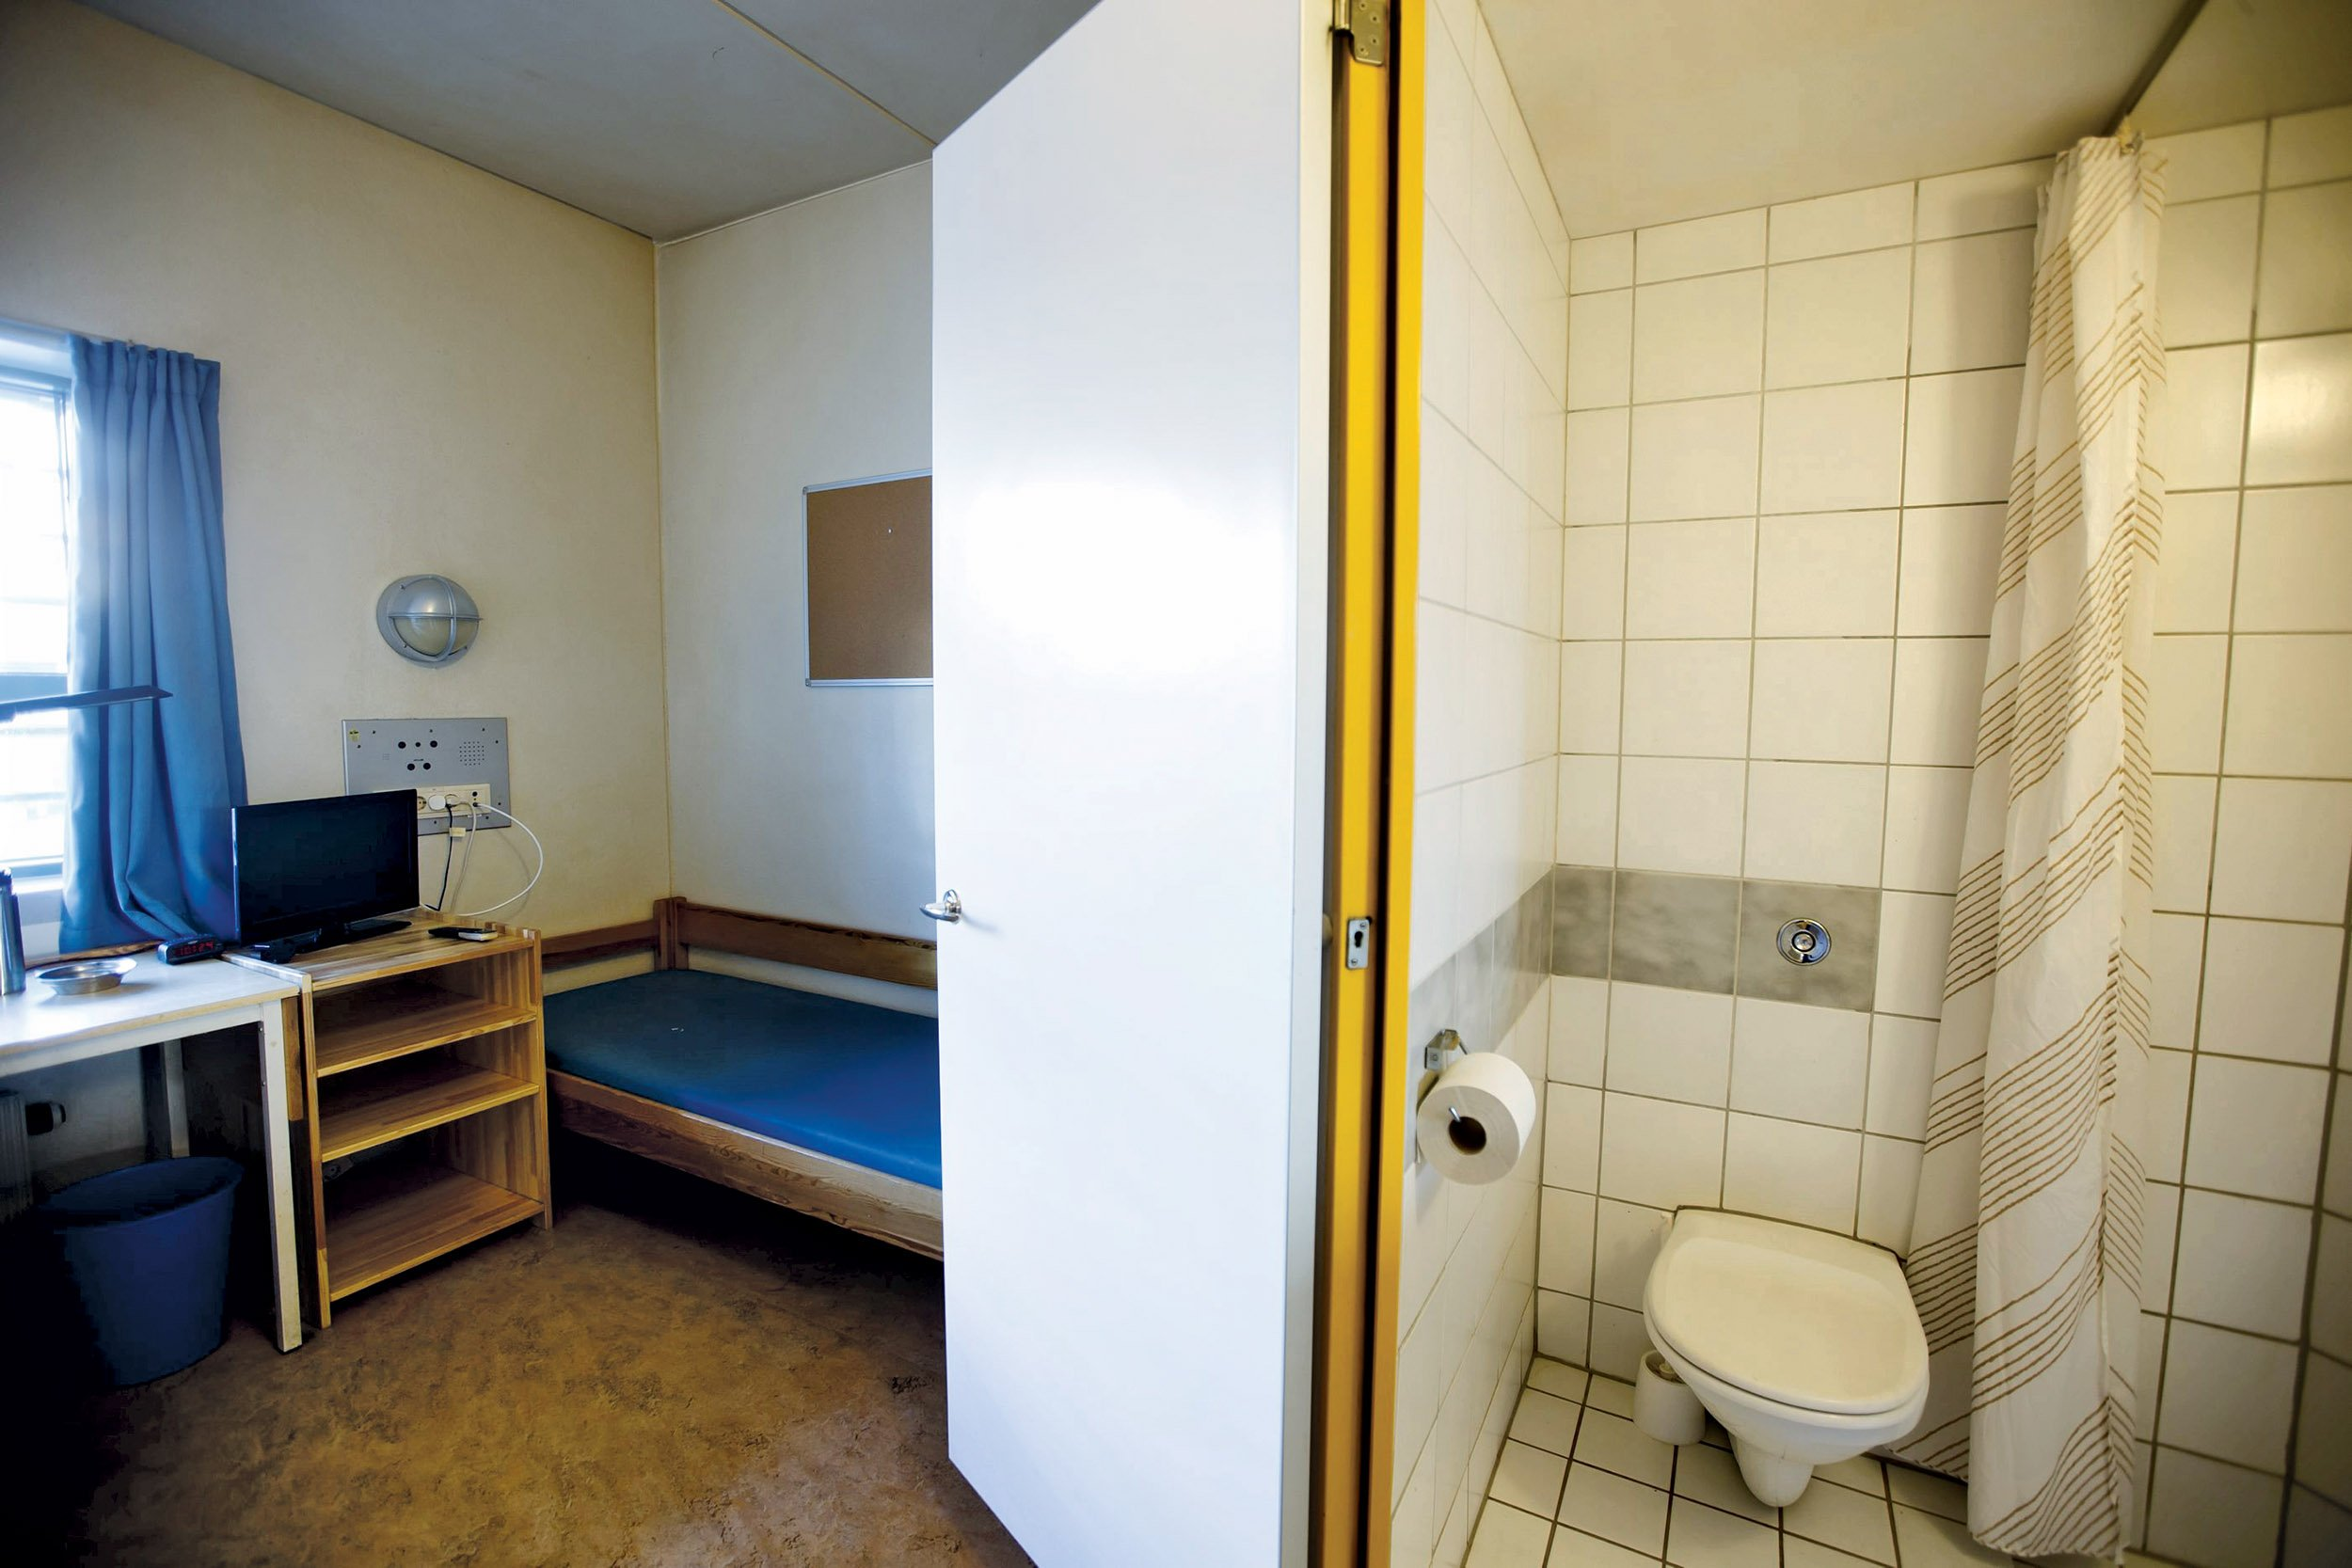 04_22_Breivik_07